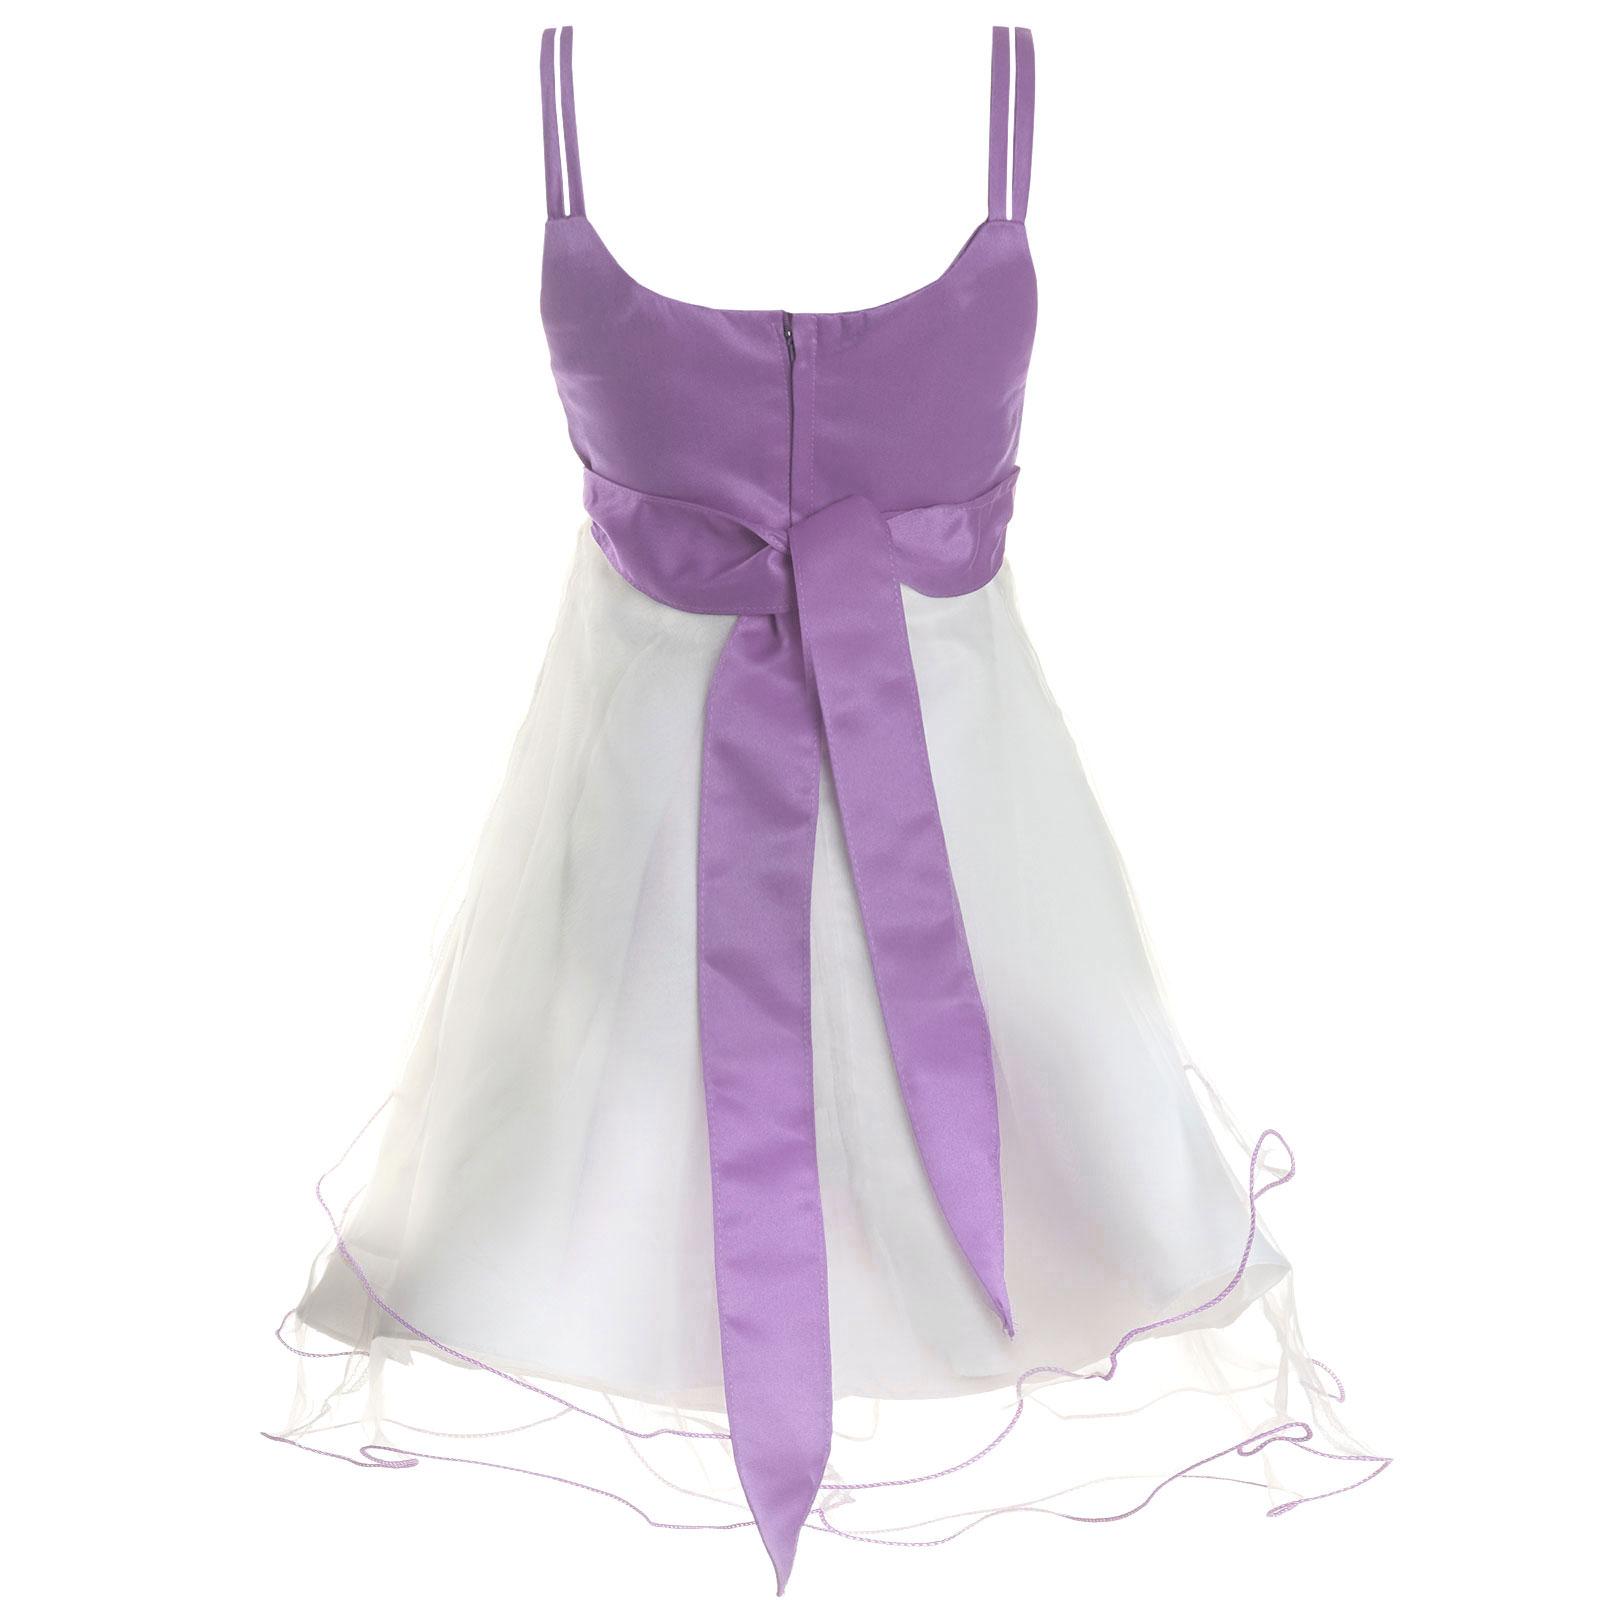 Maedchen-Kinder-Kleid-Peticoat-Festkleid-Lang-Arm-Kostuem-mit-Bolero-Rose-21476 Indexbild 9